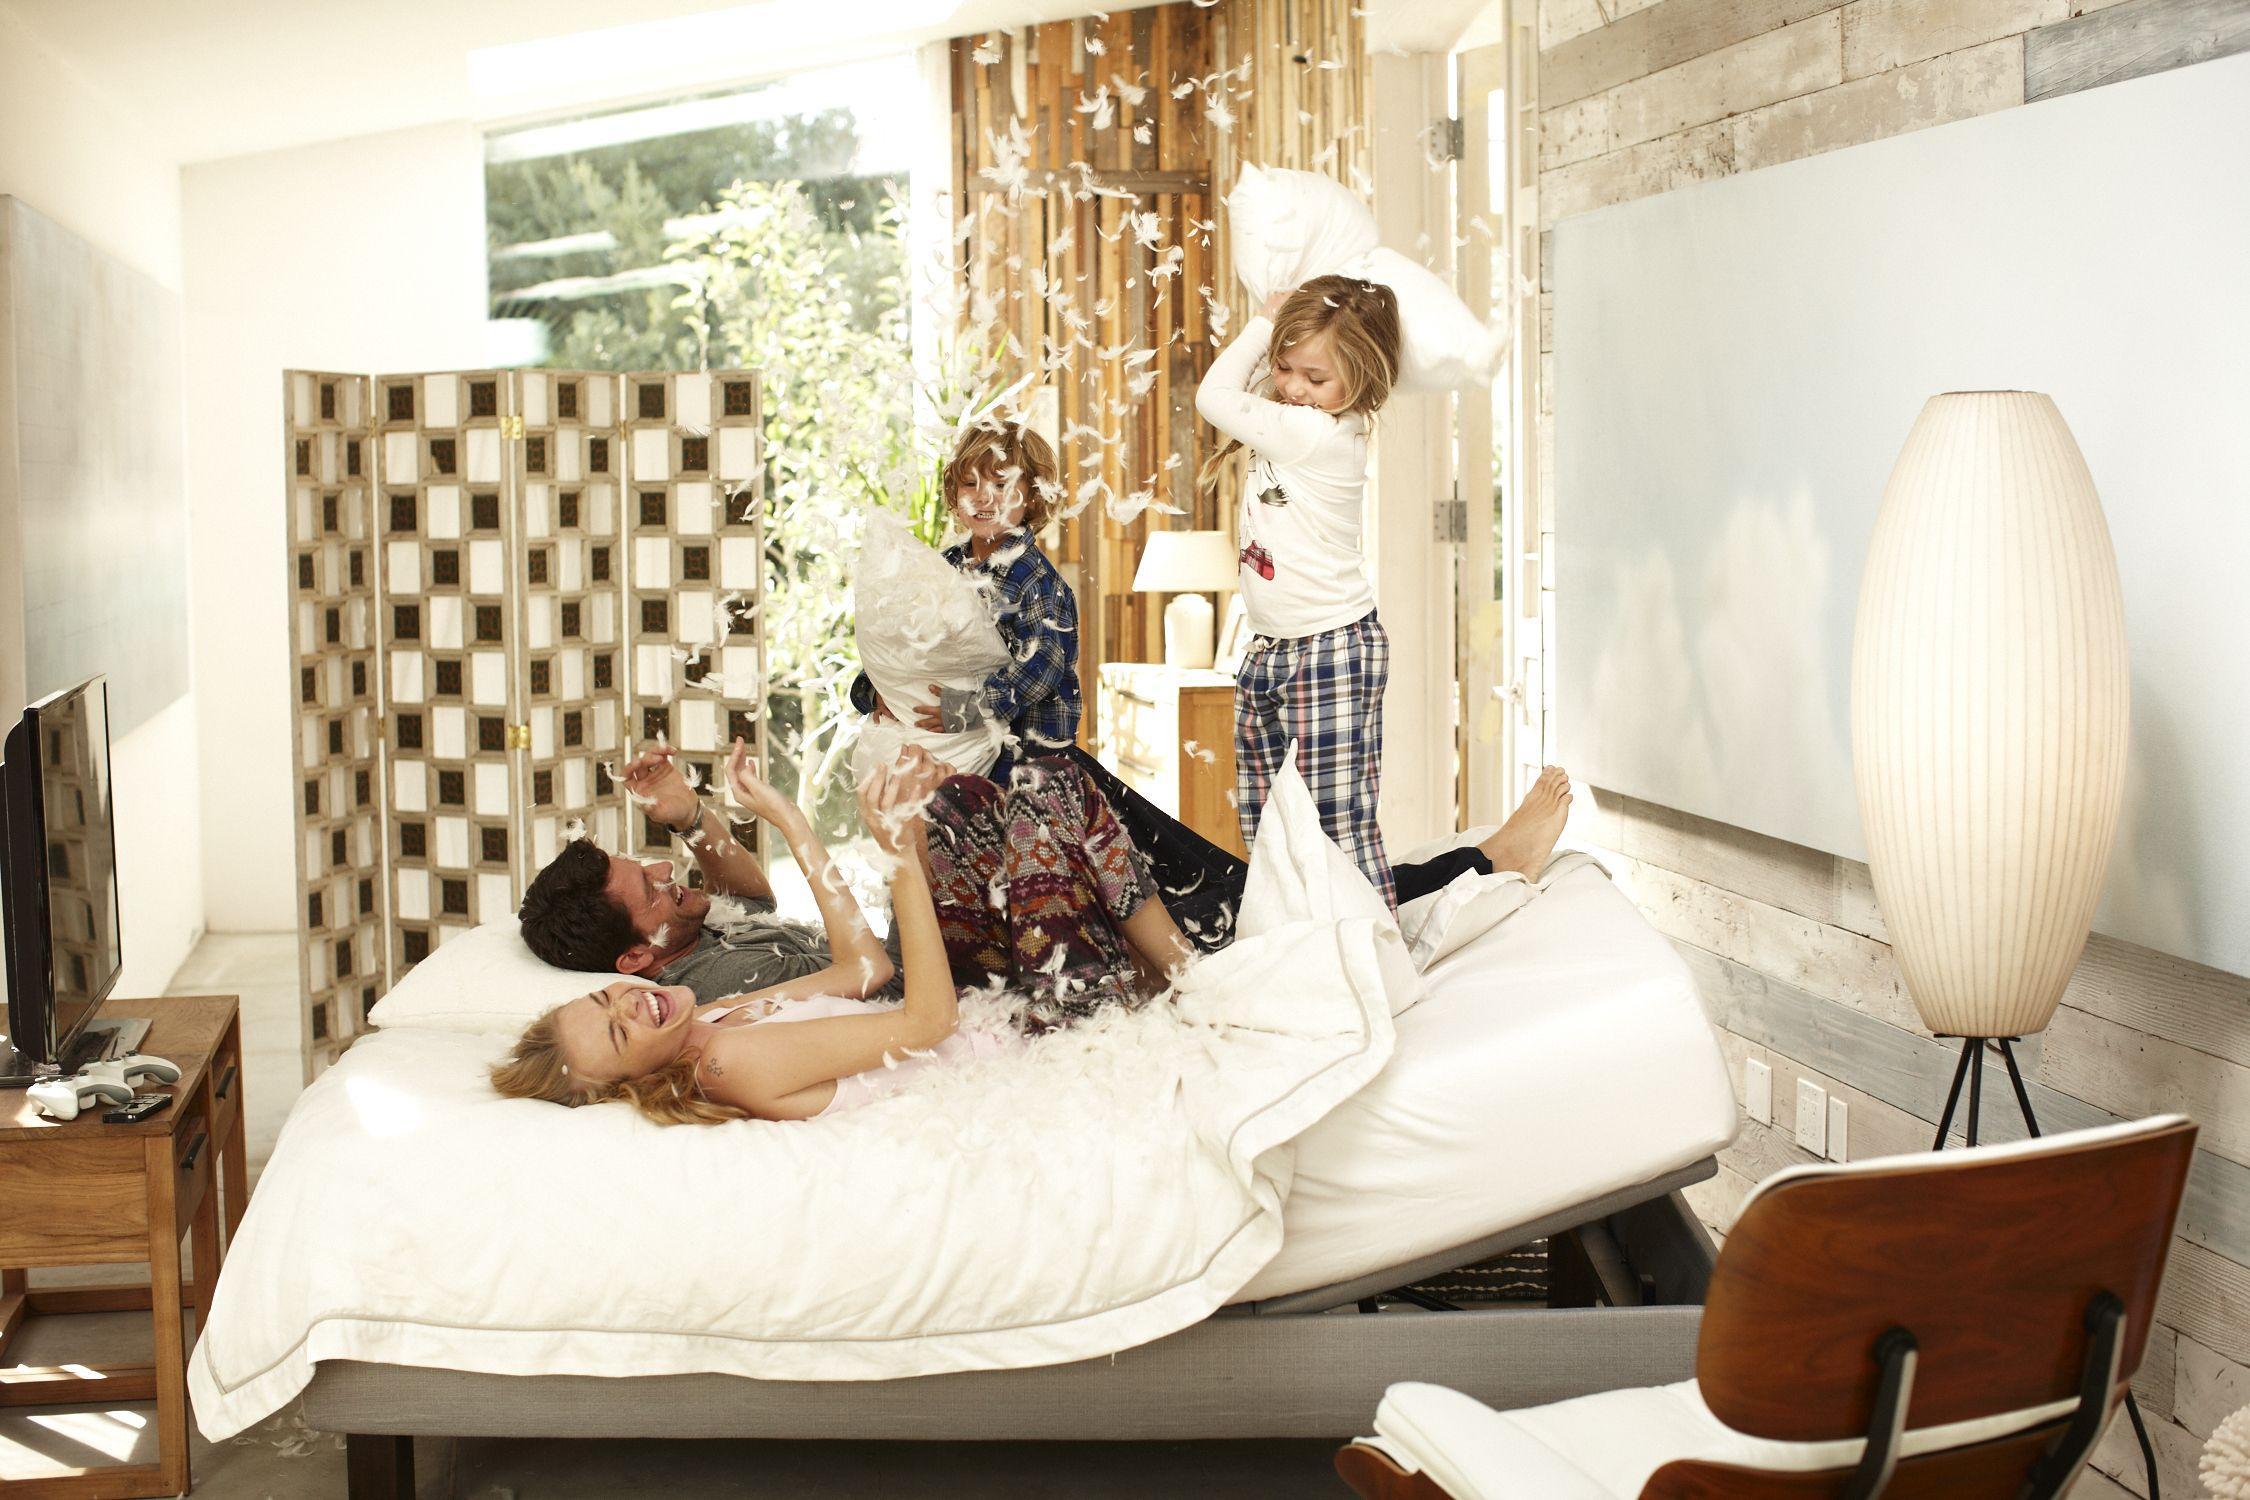 pin by julien beaudoin on lits ajustables ajustable beds pinterest